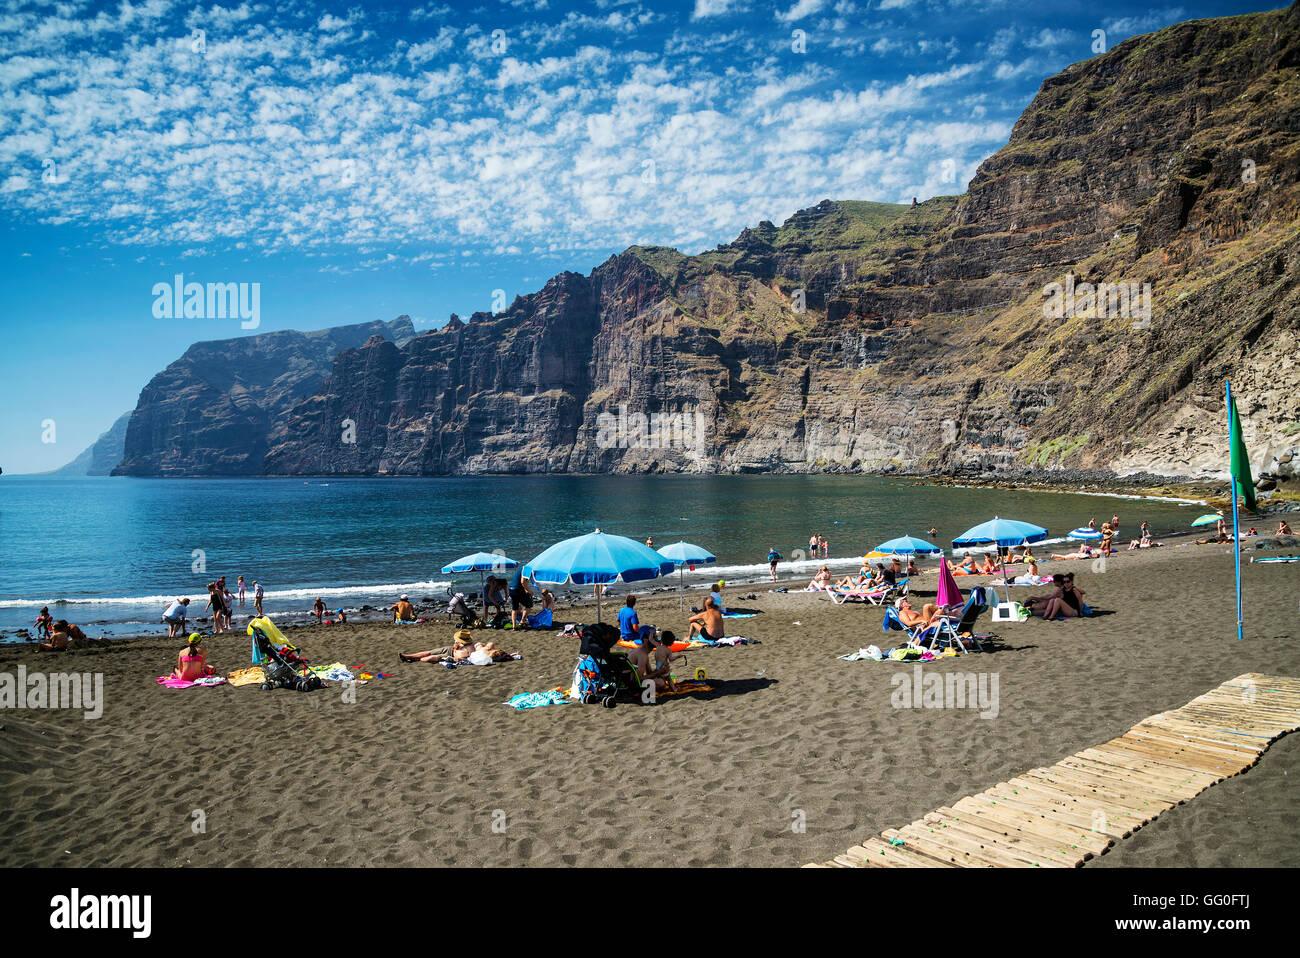 tourists at los gigantes beach landmark in south tenerife island spain - Stock Image